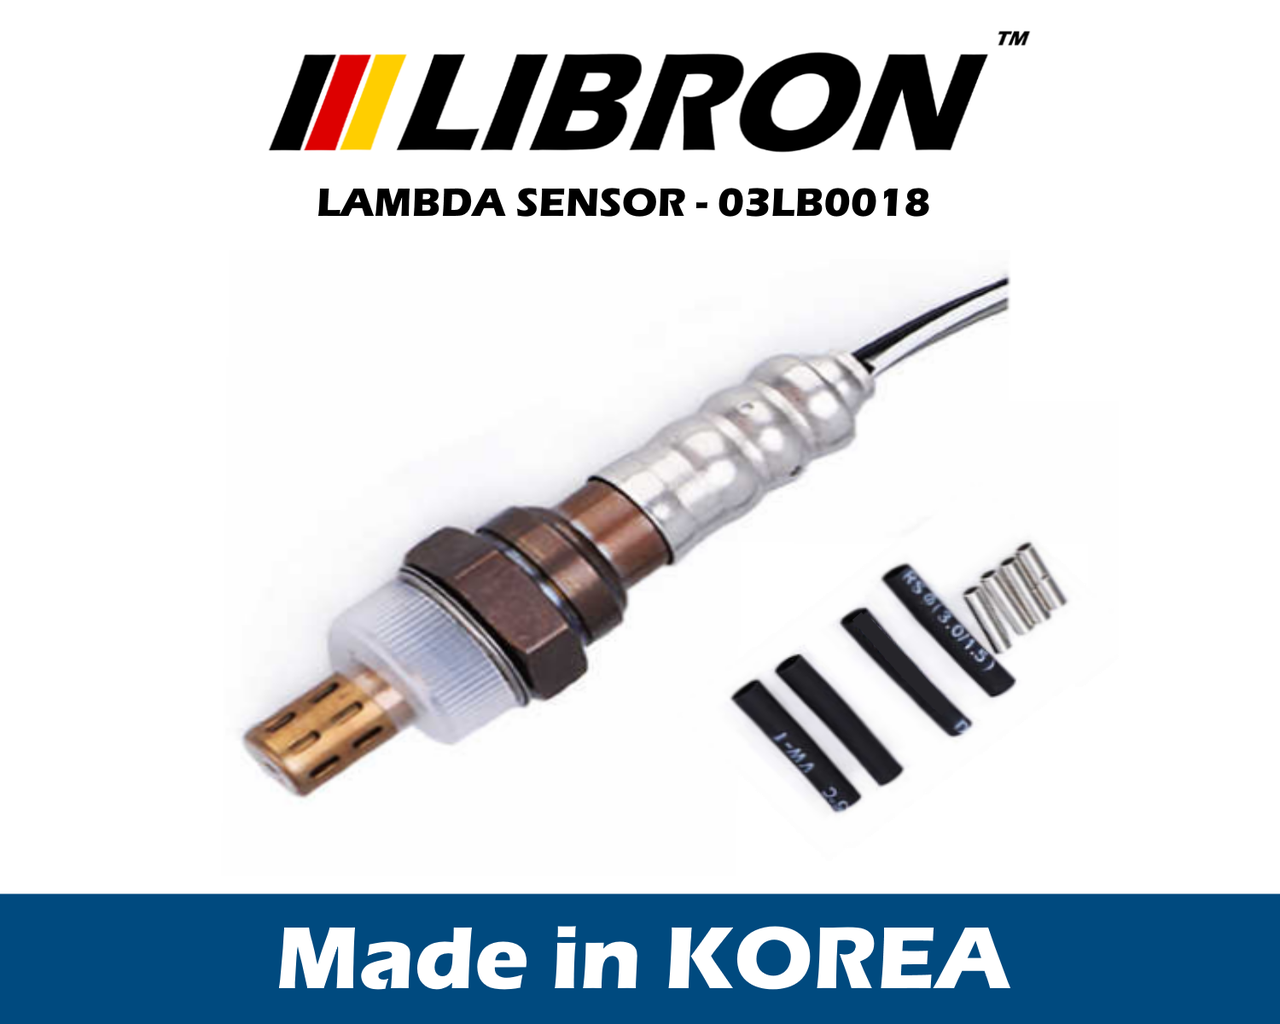 Лямбда зонд Libron 03LB0018 - Citroen  BERLINGO (MF, GJK, GFK)